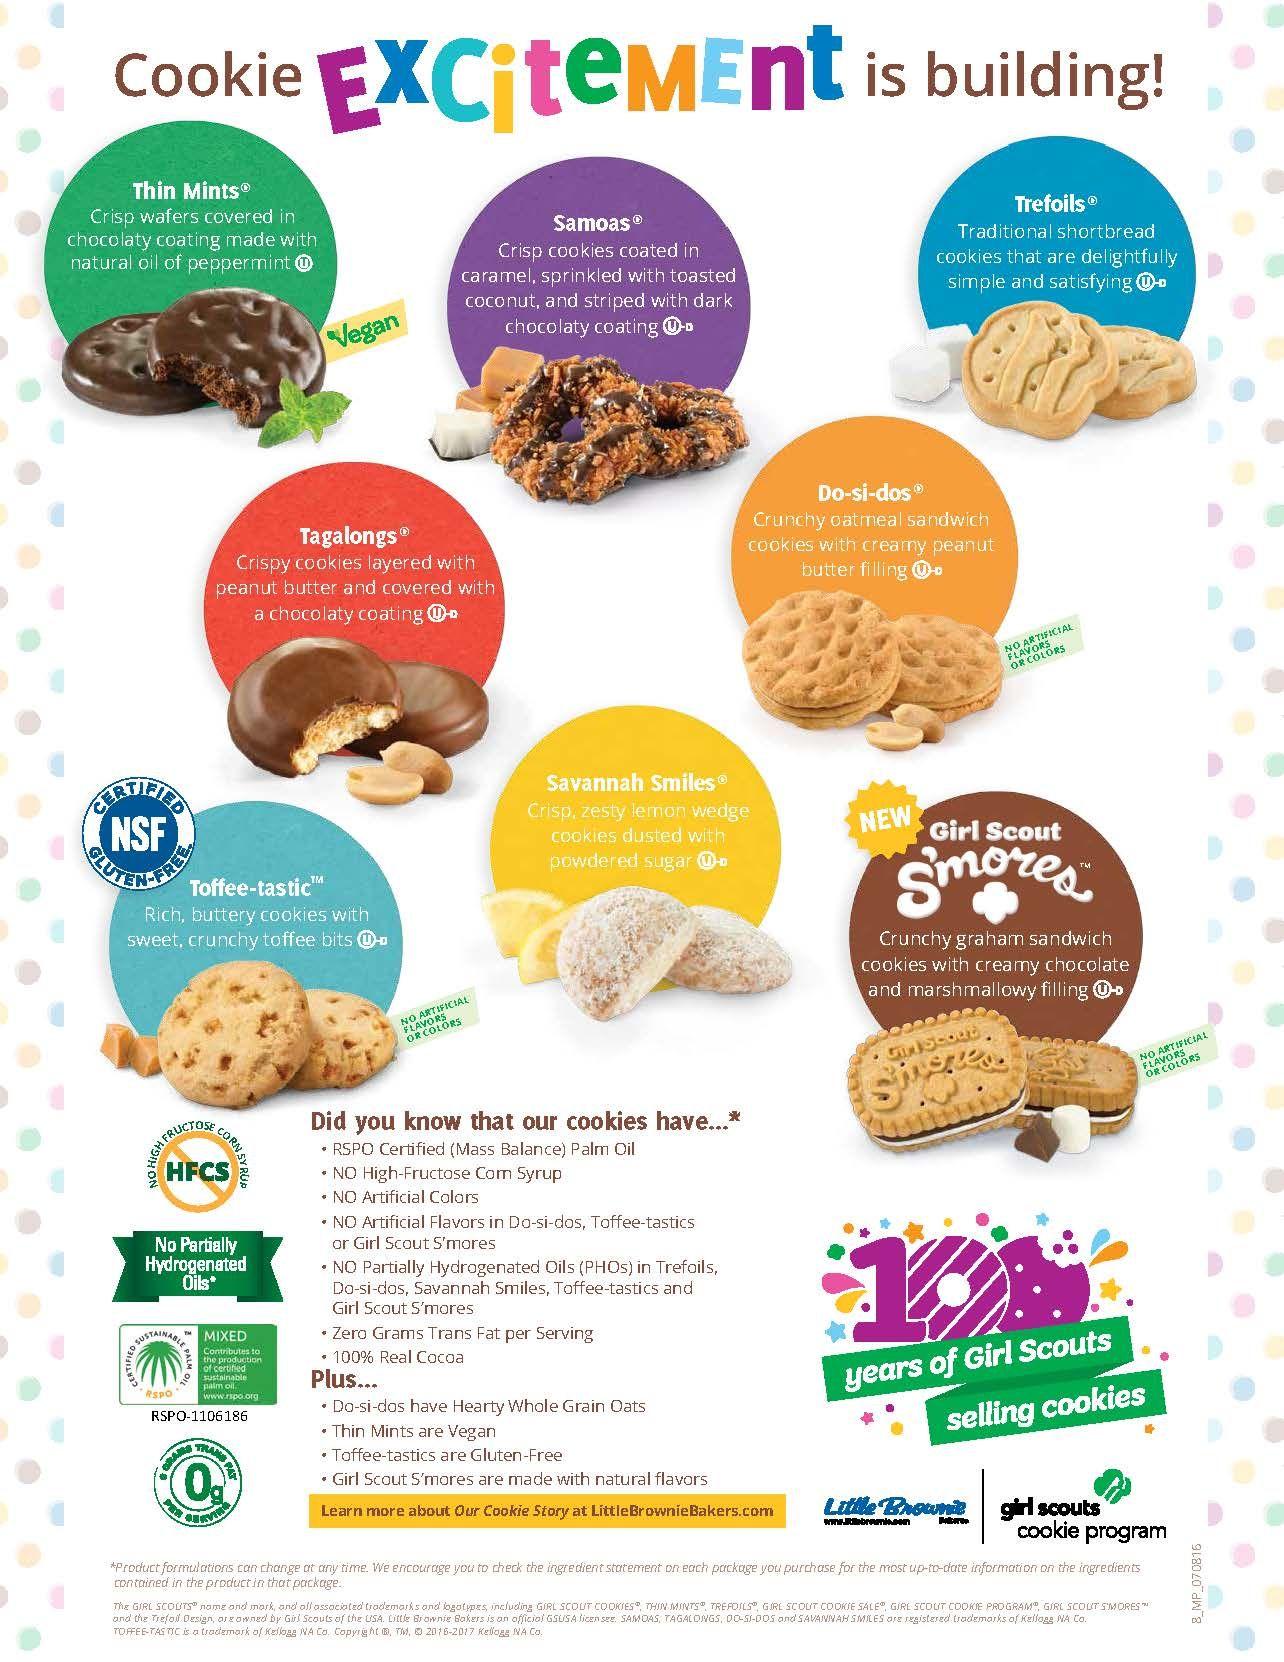 gsgla meet the cookies 2016